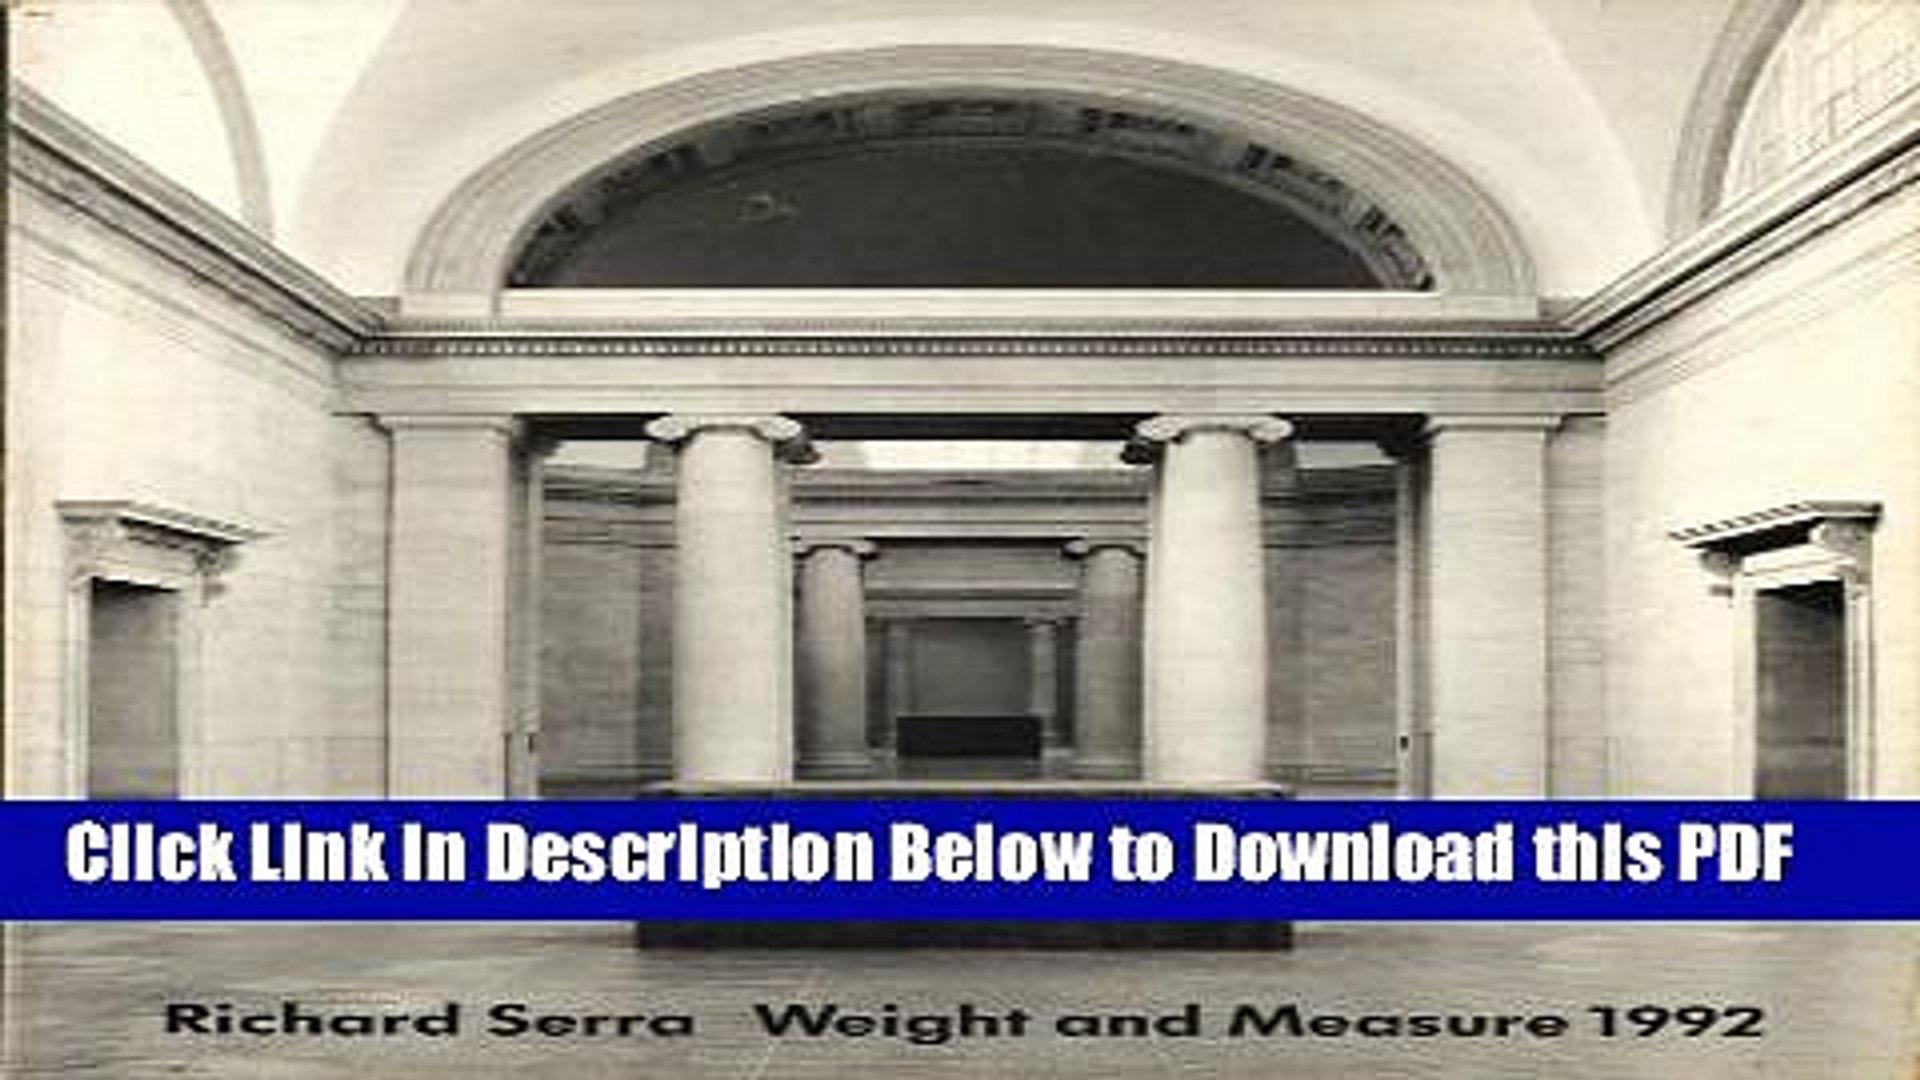 [Read] Richard Serra: Weight and Measure 1992 : 30 September 1992-15 January 1993 Free Books